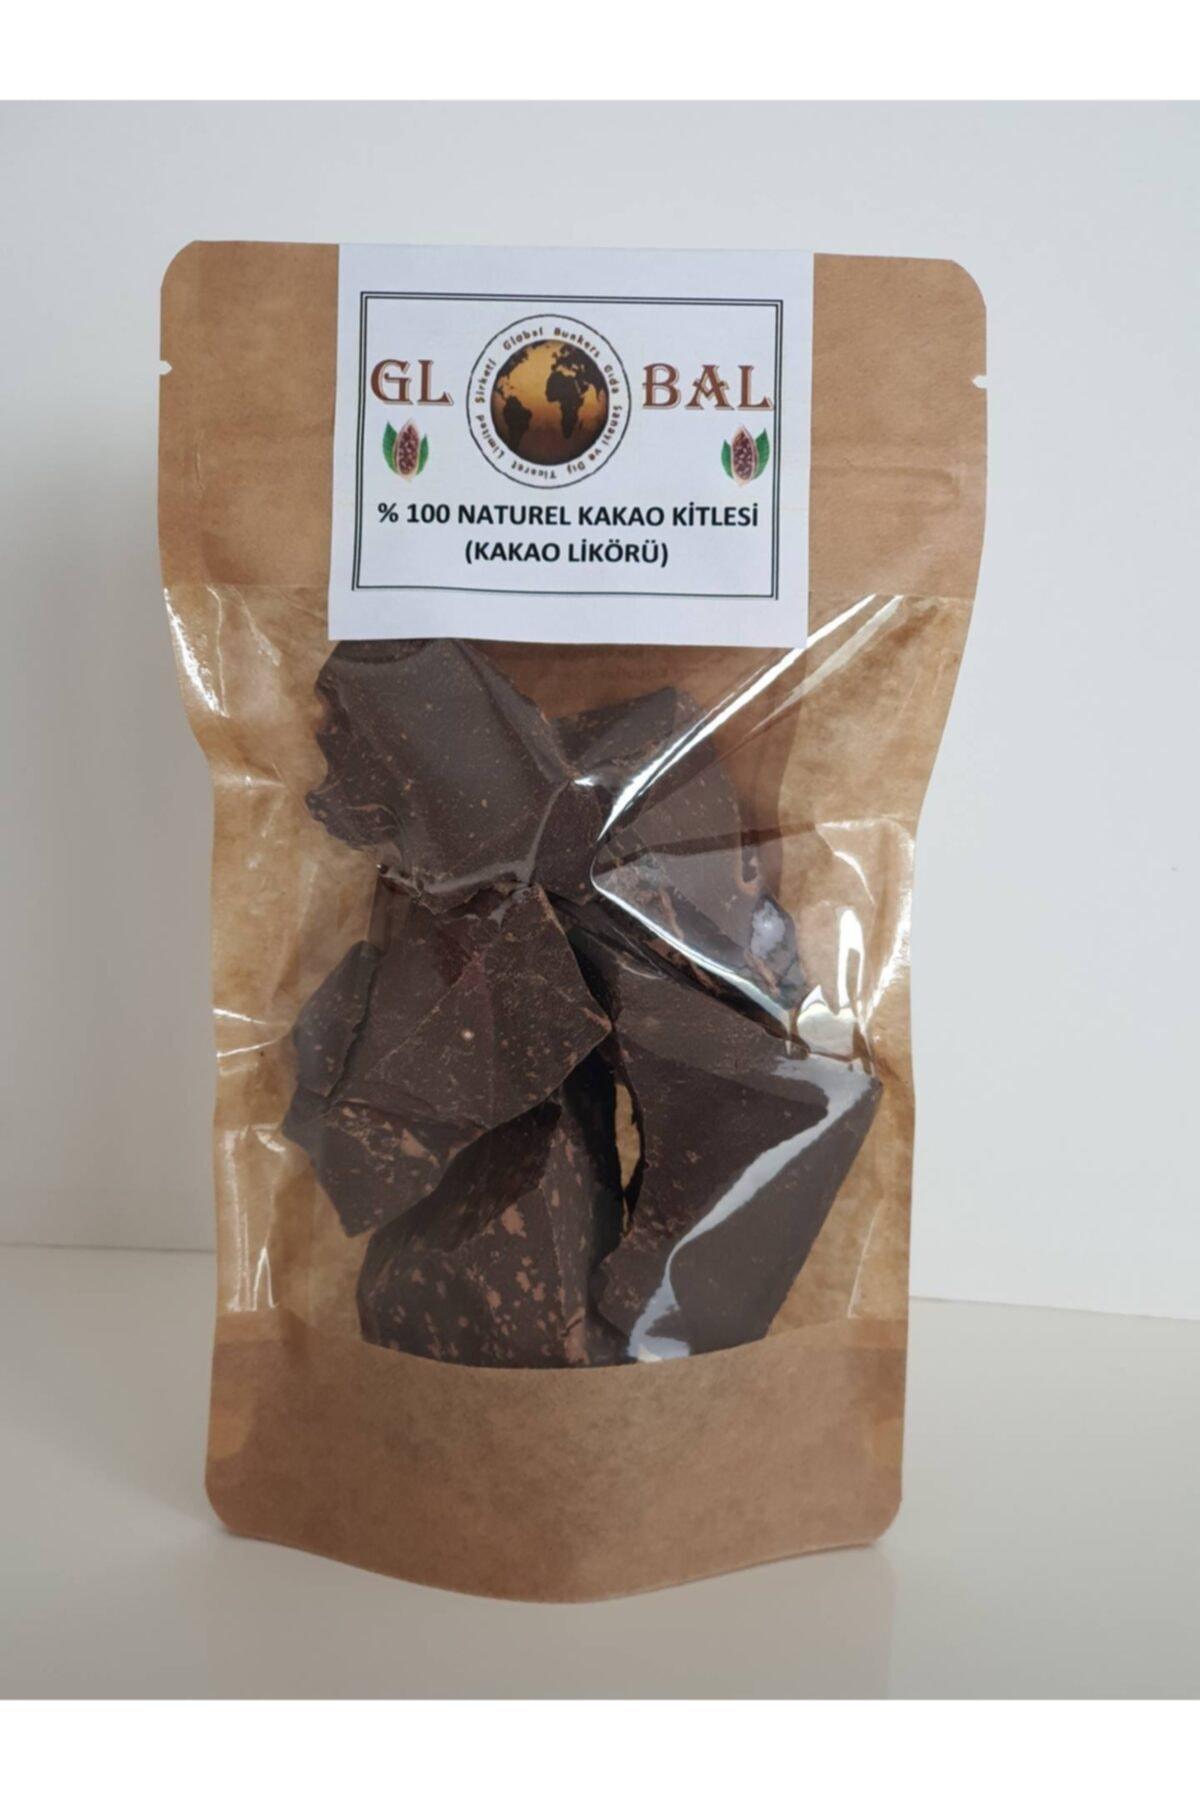 Global %100 Naturel (ham) Kakao Kitlesi(kakao Likörü)-%100 Bitter Çikolata-200 Gr 1